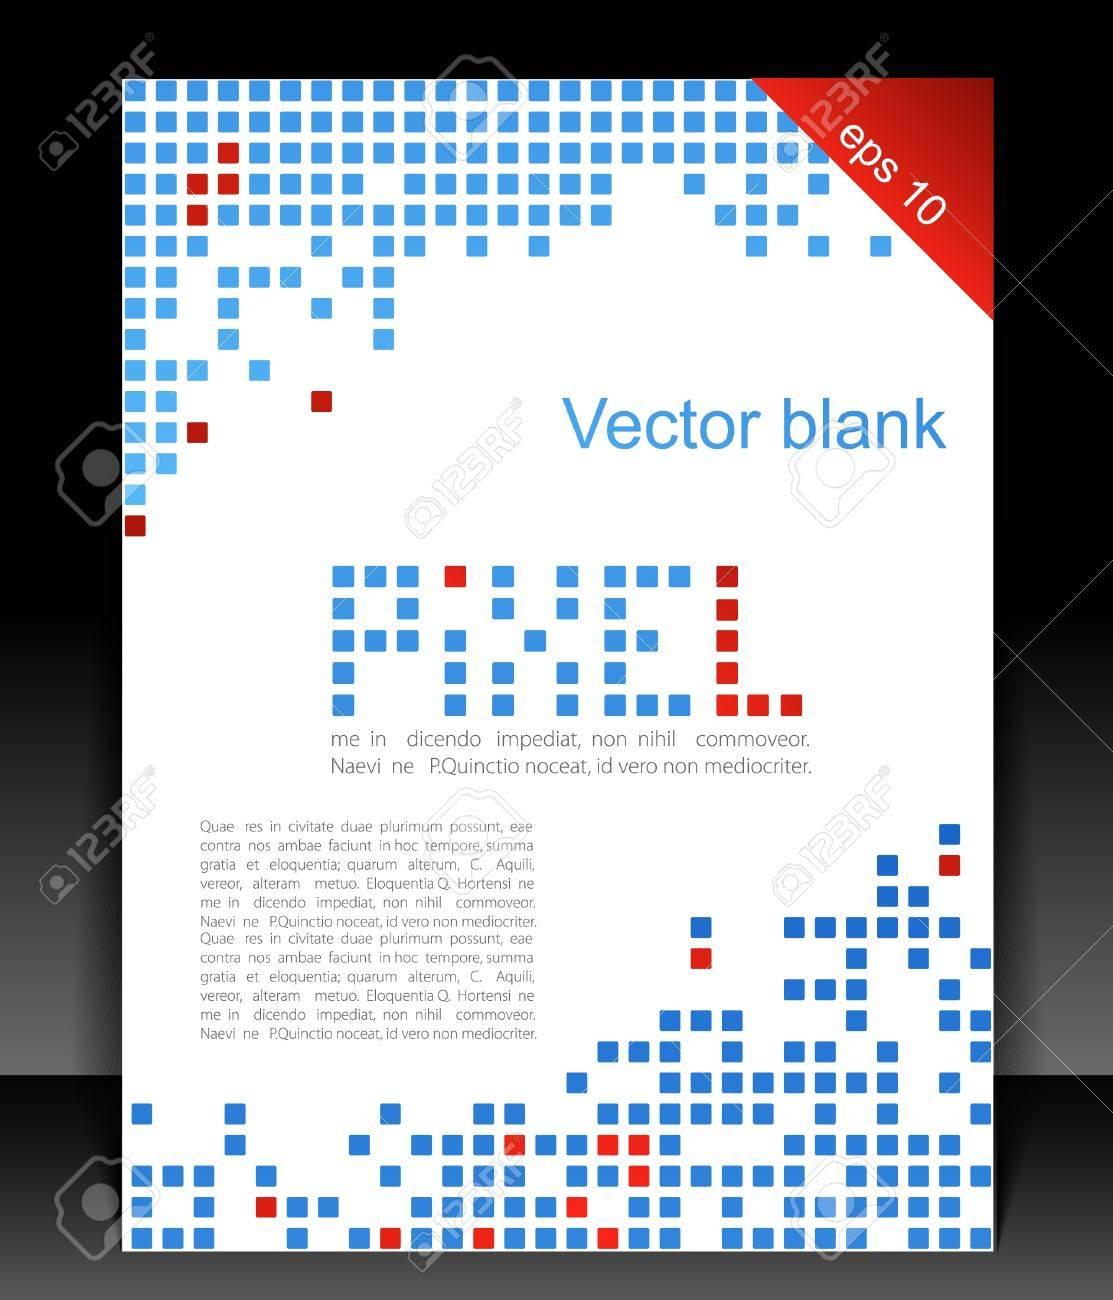 Abstract Blank Pixel Art